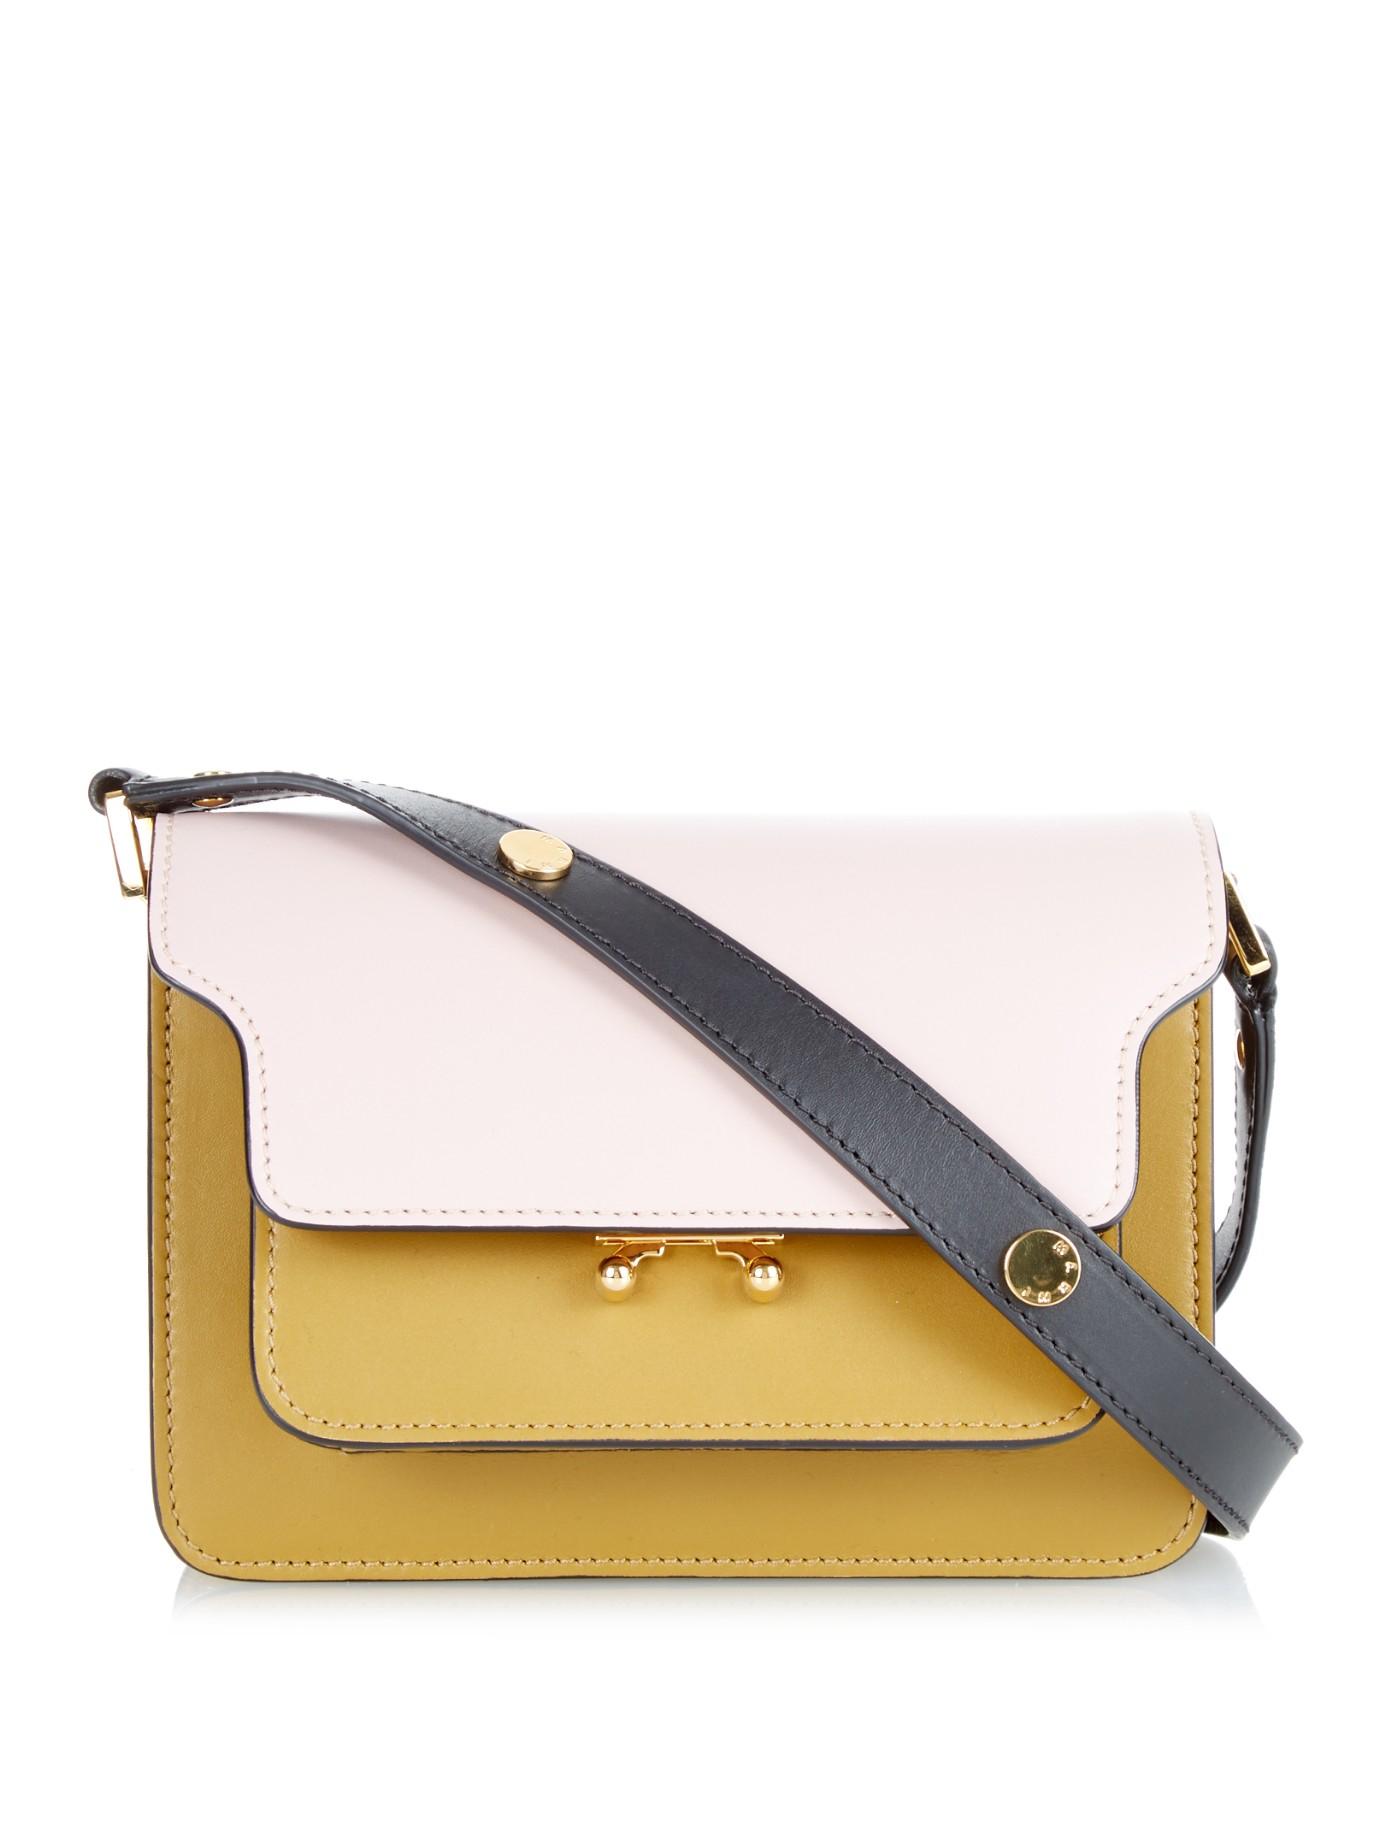 Lyst - Marni Trunk Mini Leather Shoulder Bag in Pink ca531104eb12c